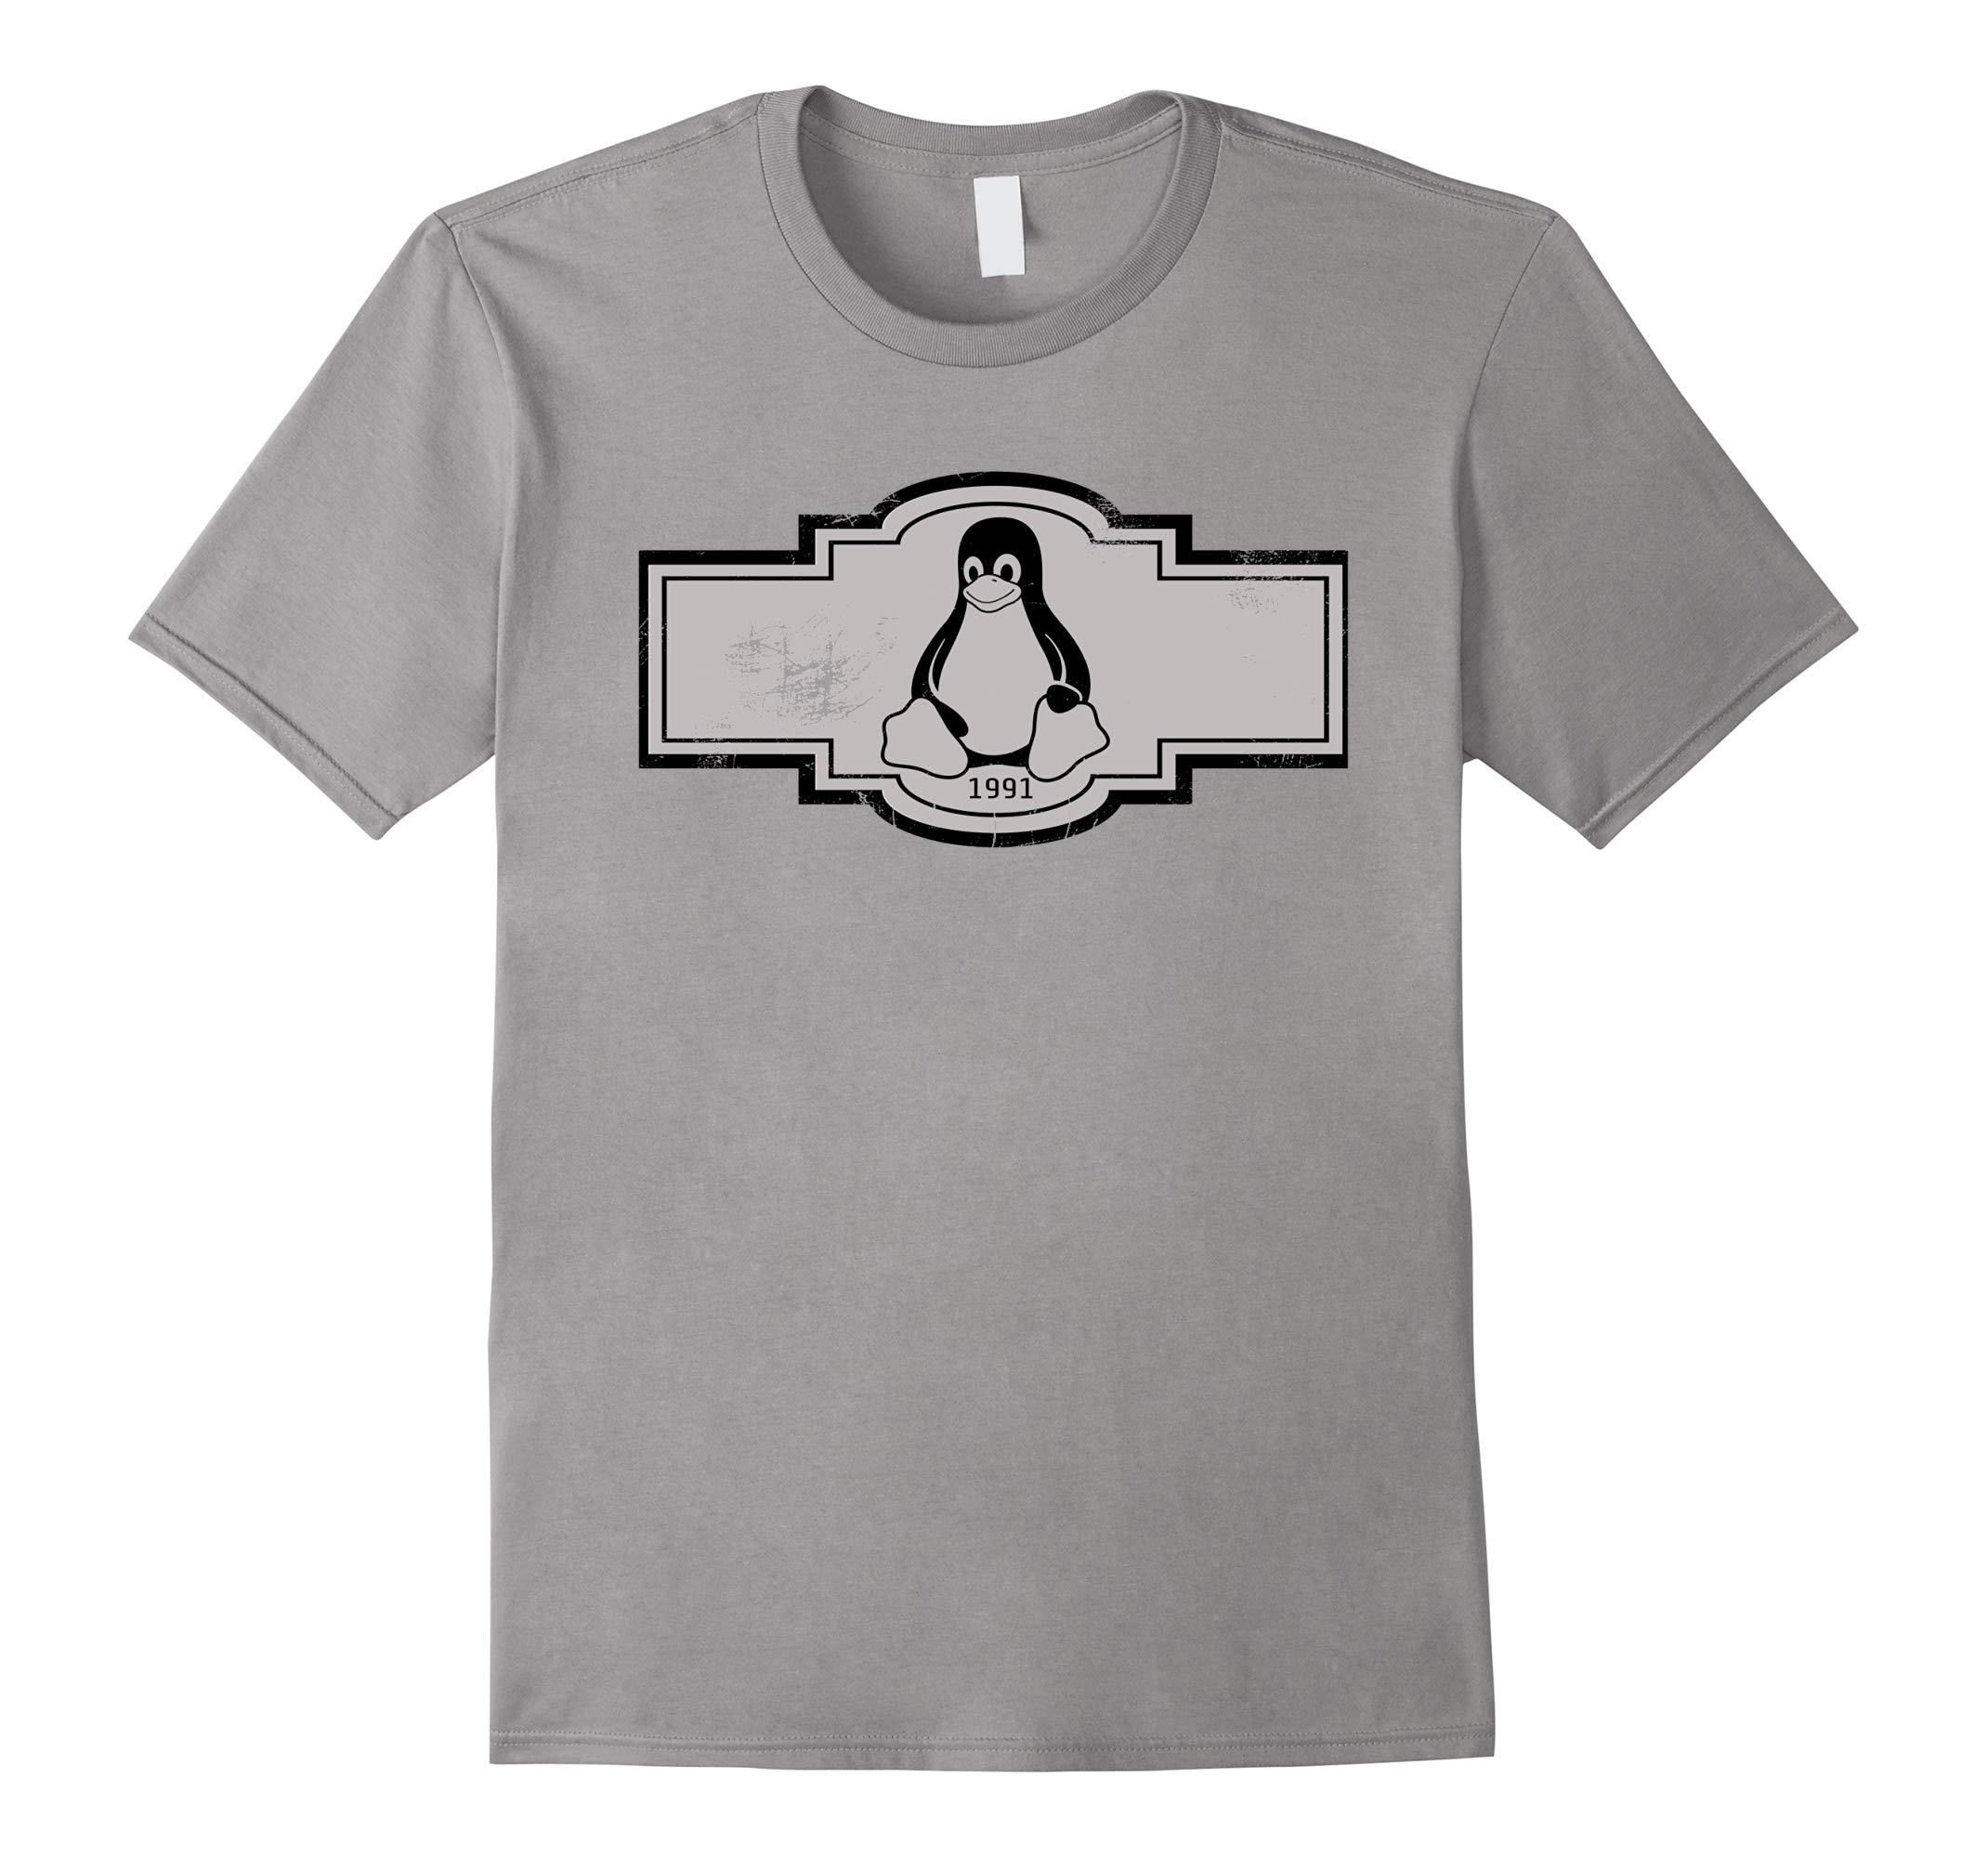 LINUX T SHIRT - Tux the penguin Tee-RT